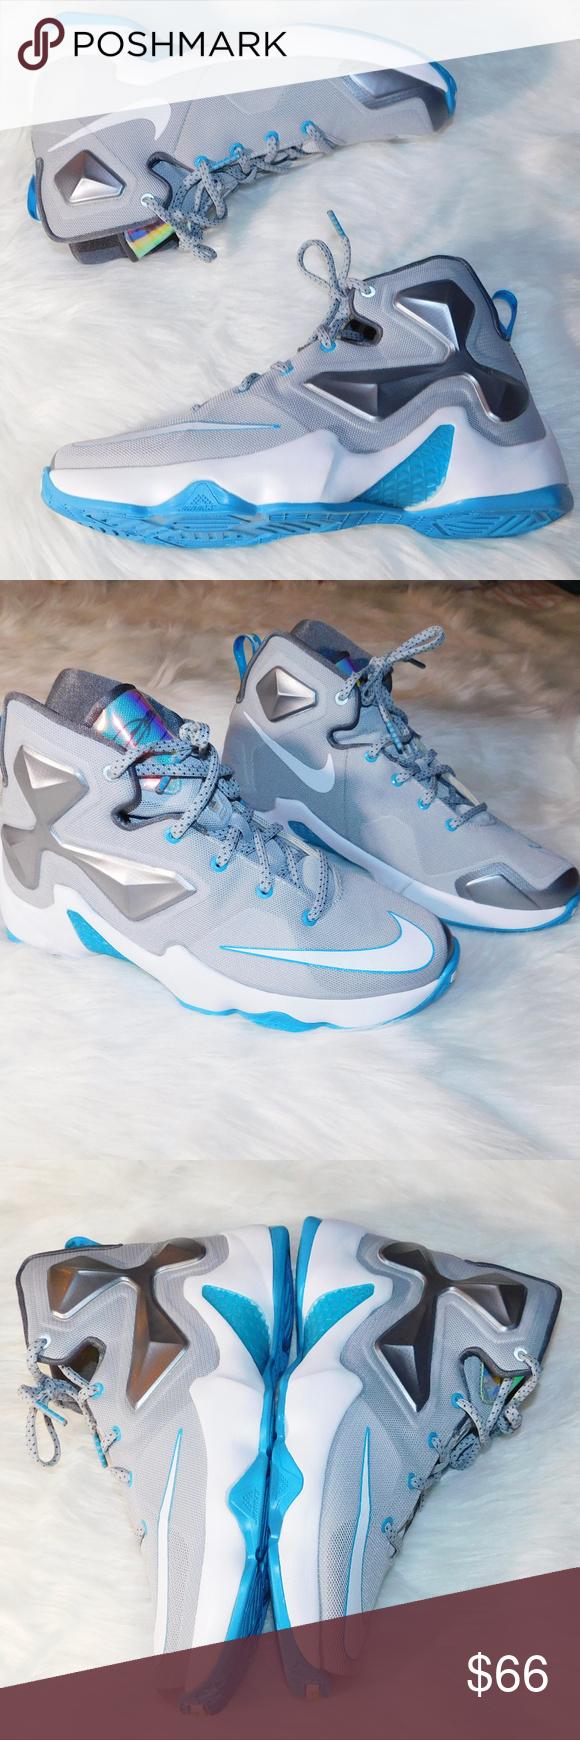 e6d18d4f25b1f NEW Nike Lebron Gray Blue High top Sneakers Size 7 NEW LEBRON JAMES XIII 13  -